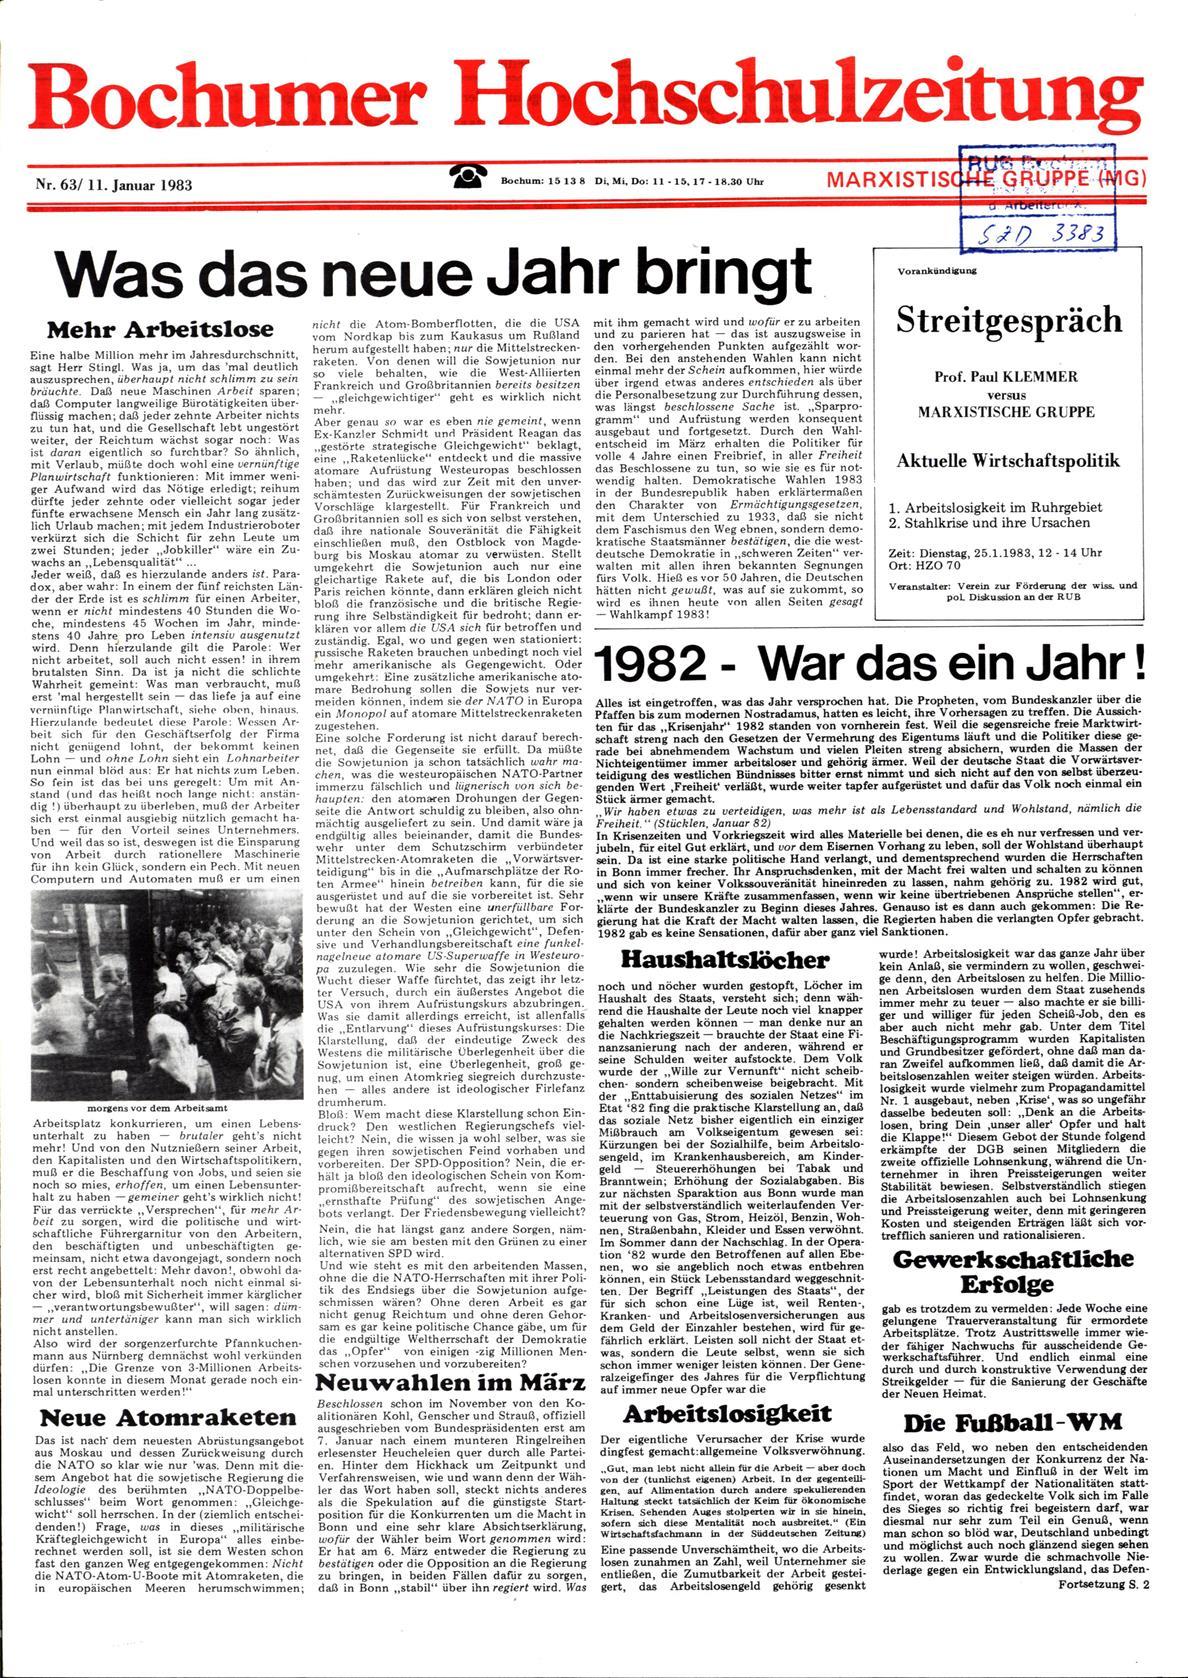 Bochum_BHZ_19830111_063_001